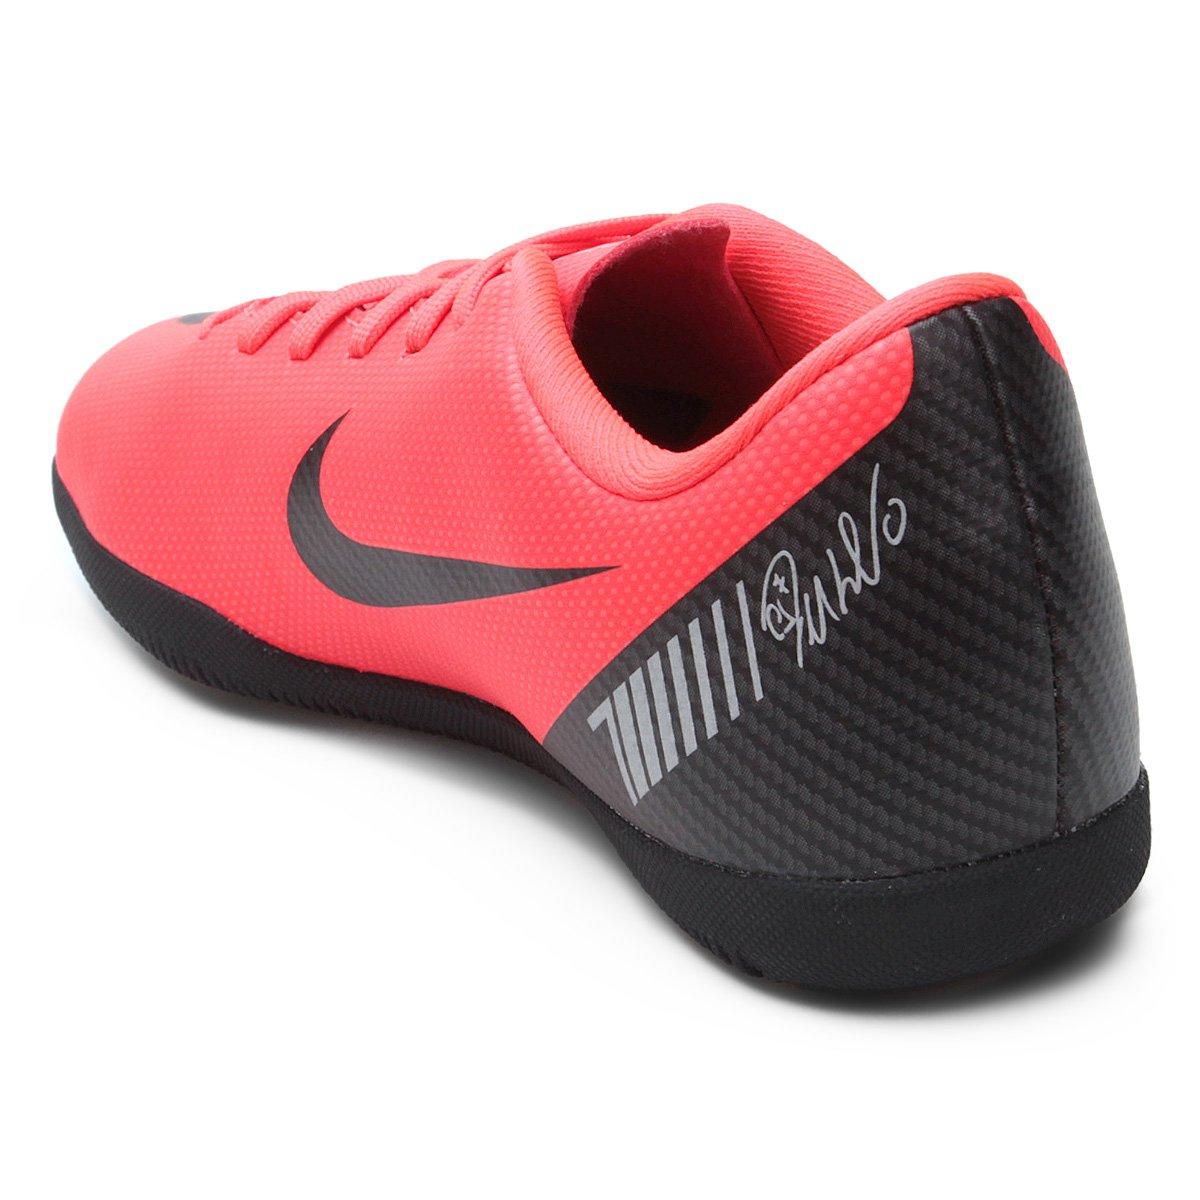 ... Chuteira Futsal Infantil Nike Mercurial Vapor 12 Club GS CR7 IC ... 58a3c7e4a3dbc